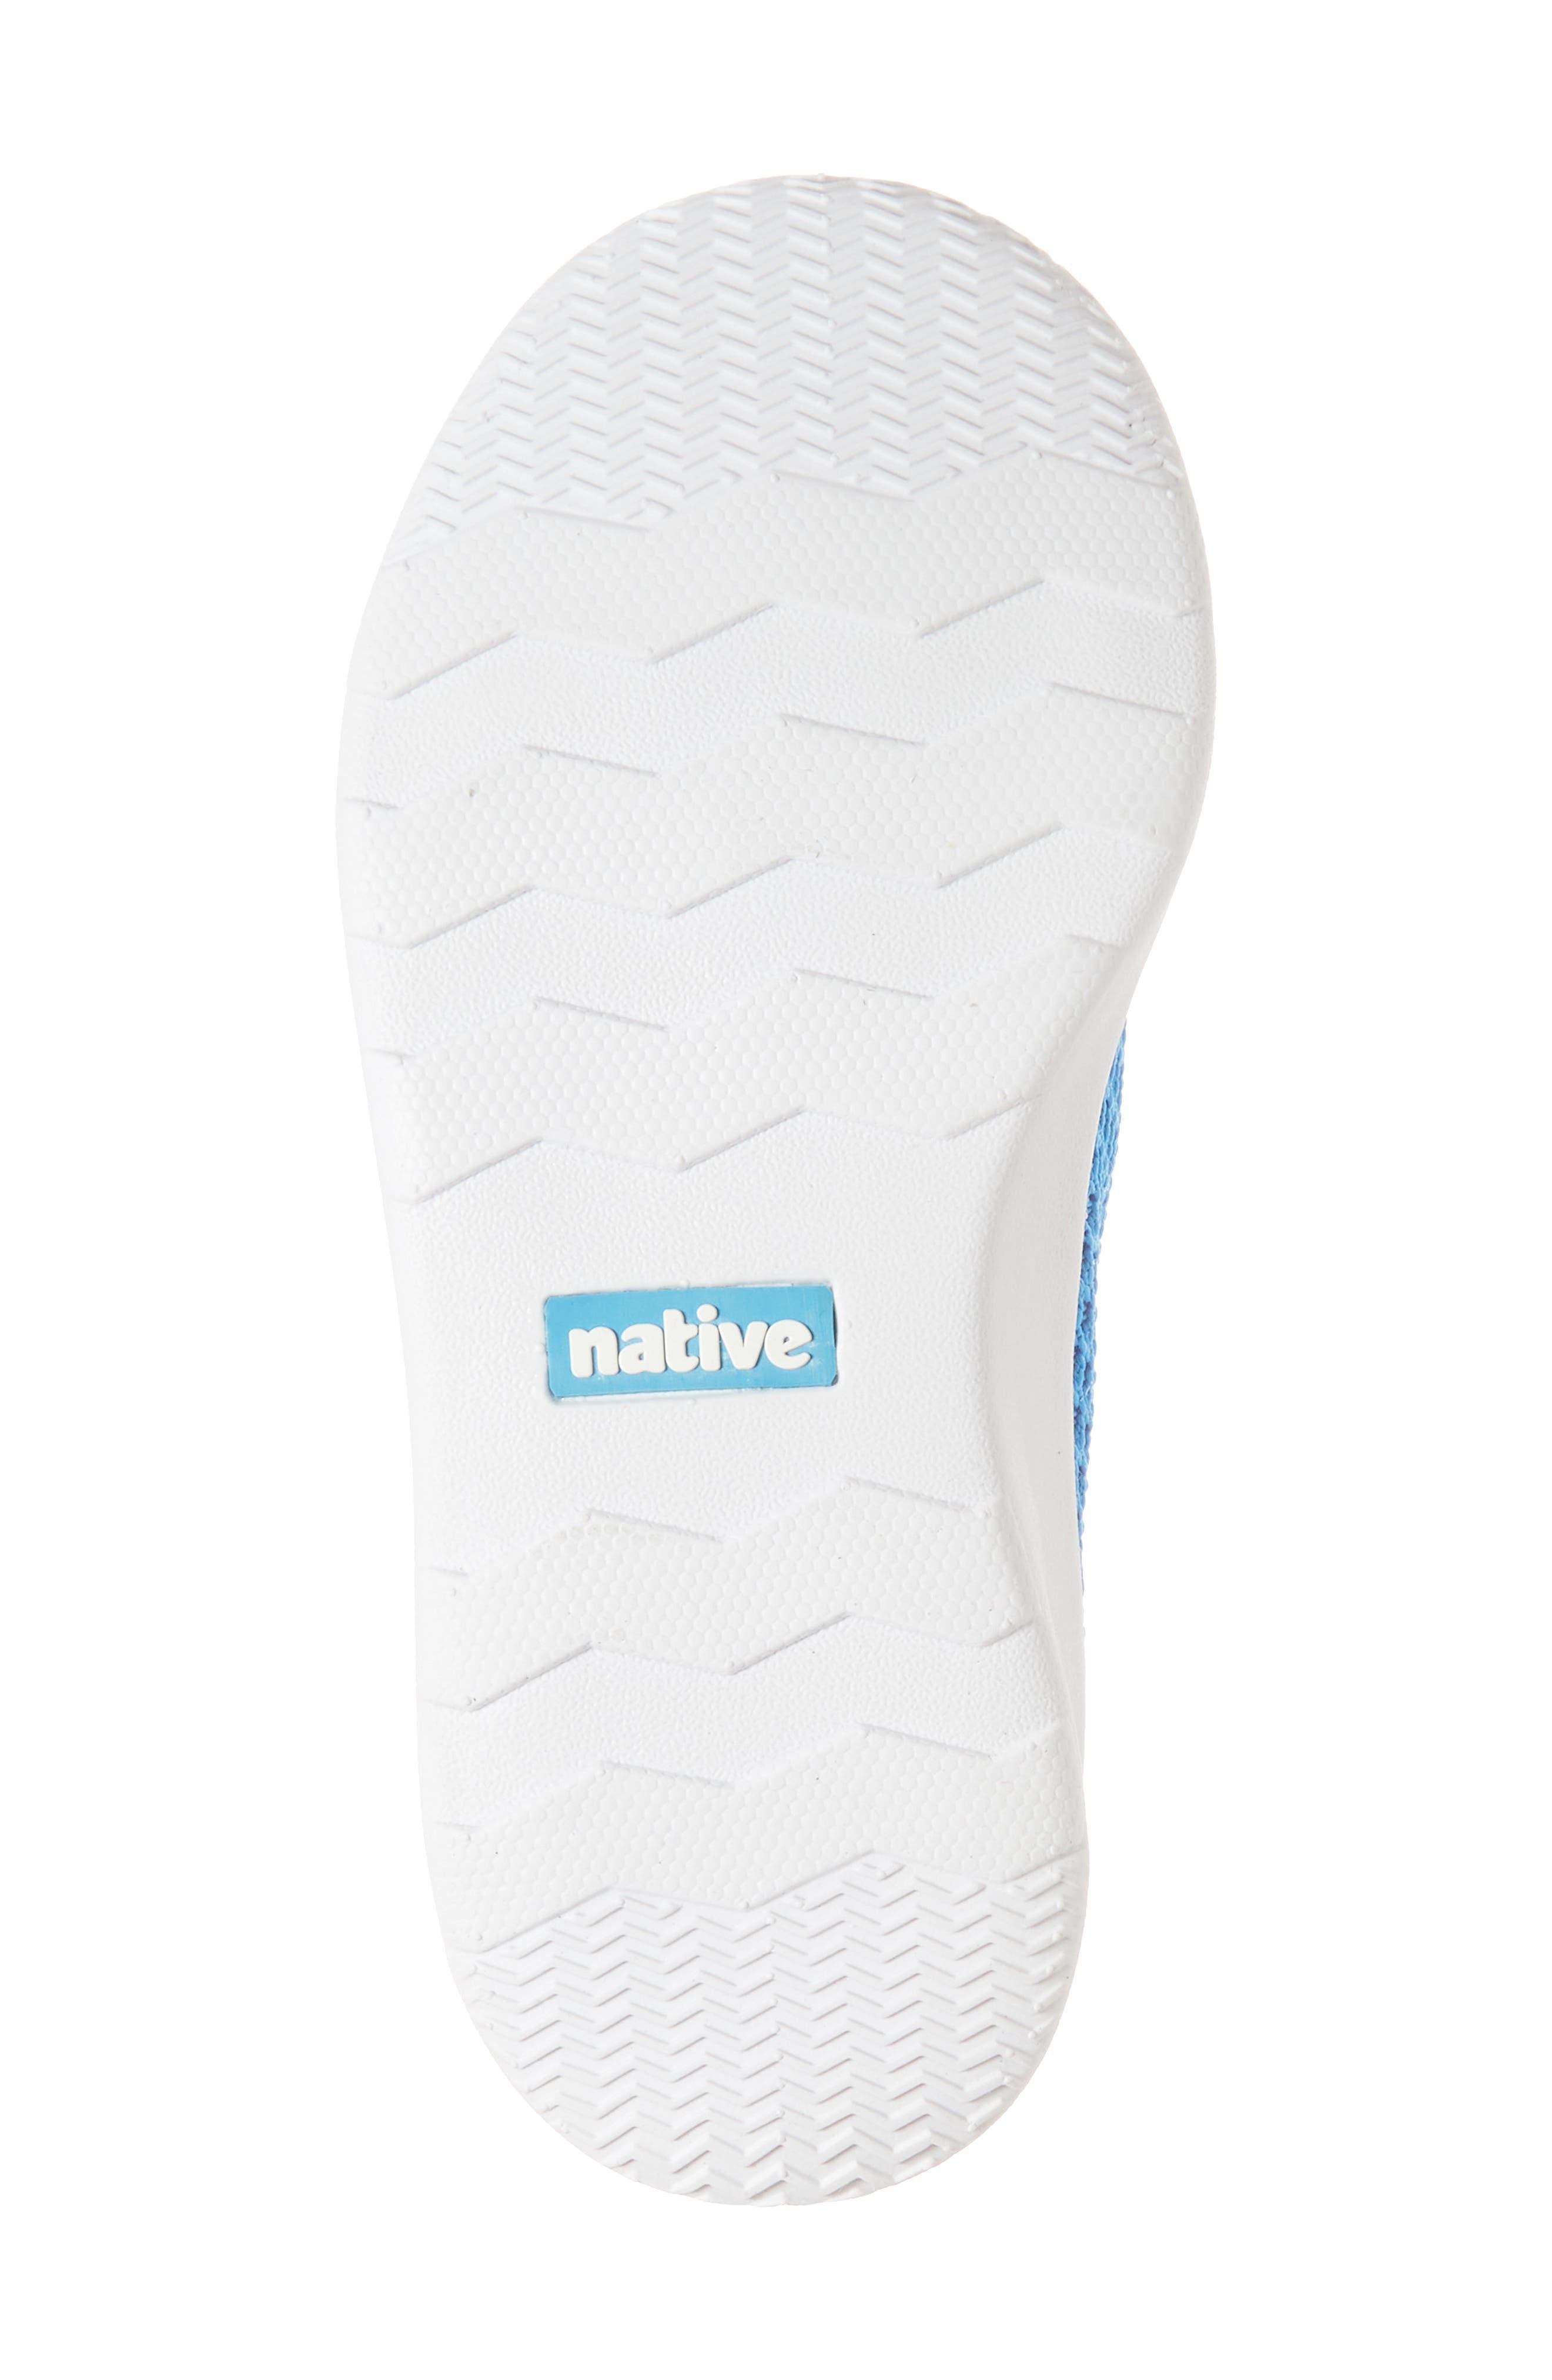 AP Mercury LiteKnit Sneaker,                             Alternate thumbnail 6, color,                             Wave Blue/ Shell White